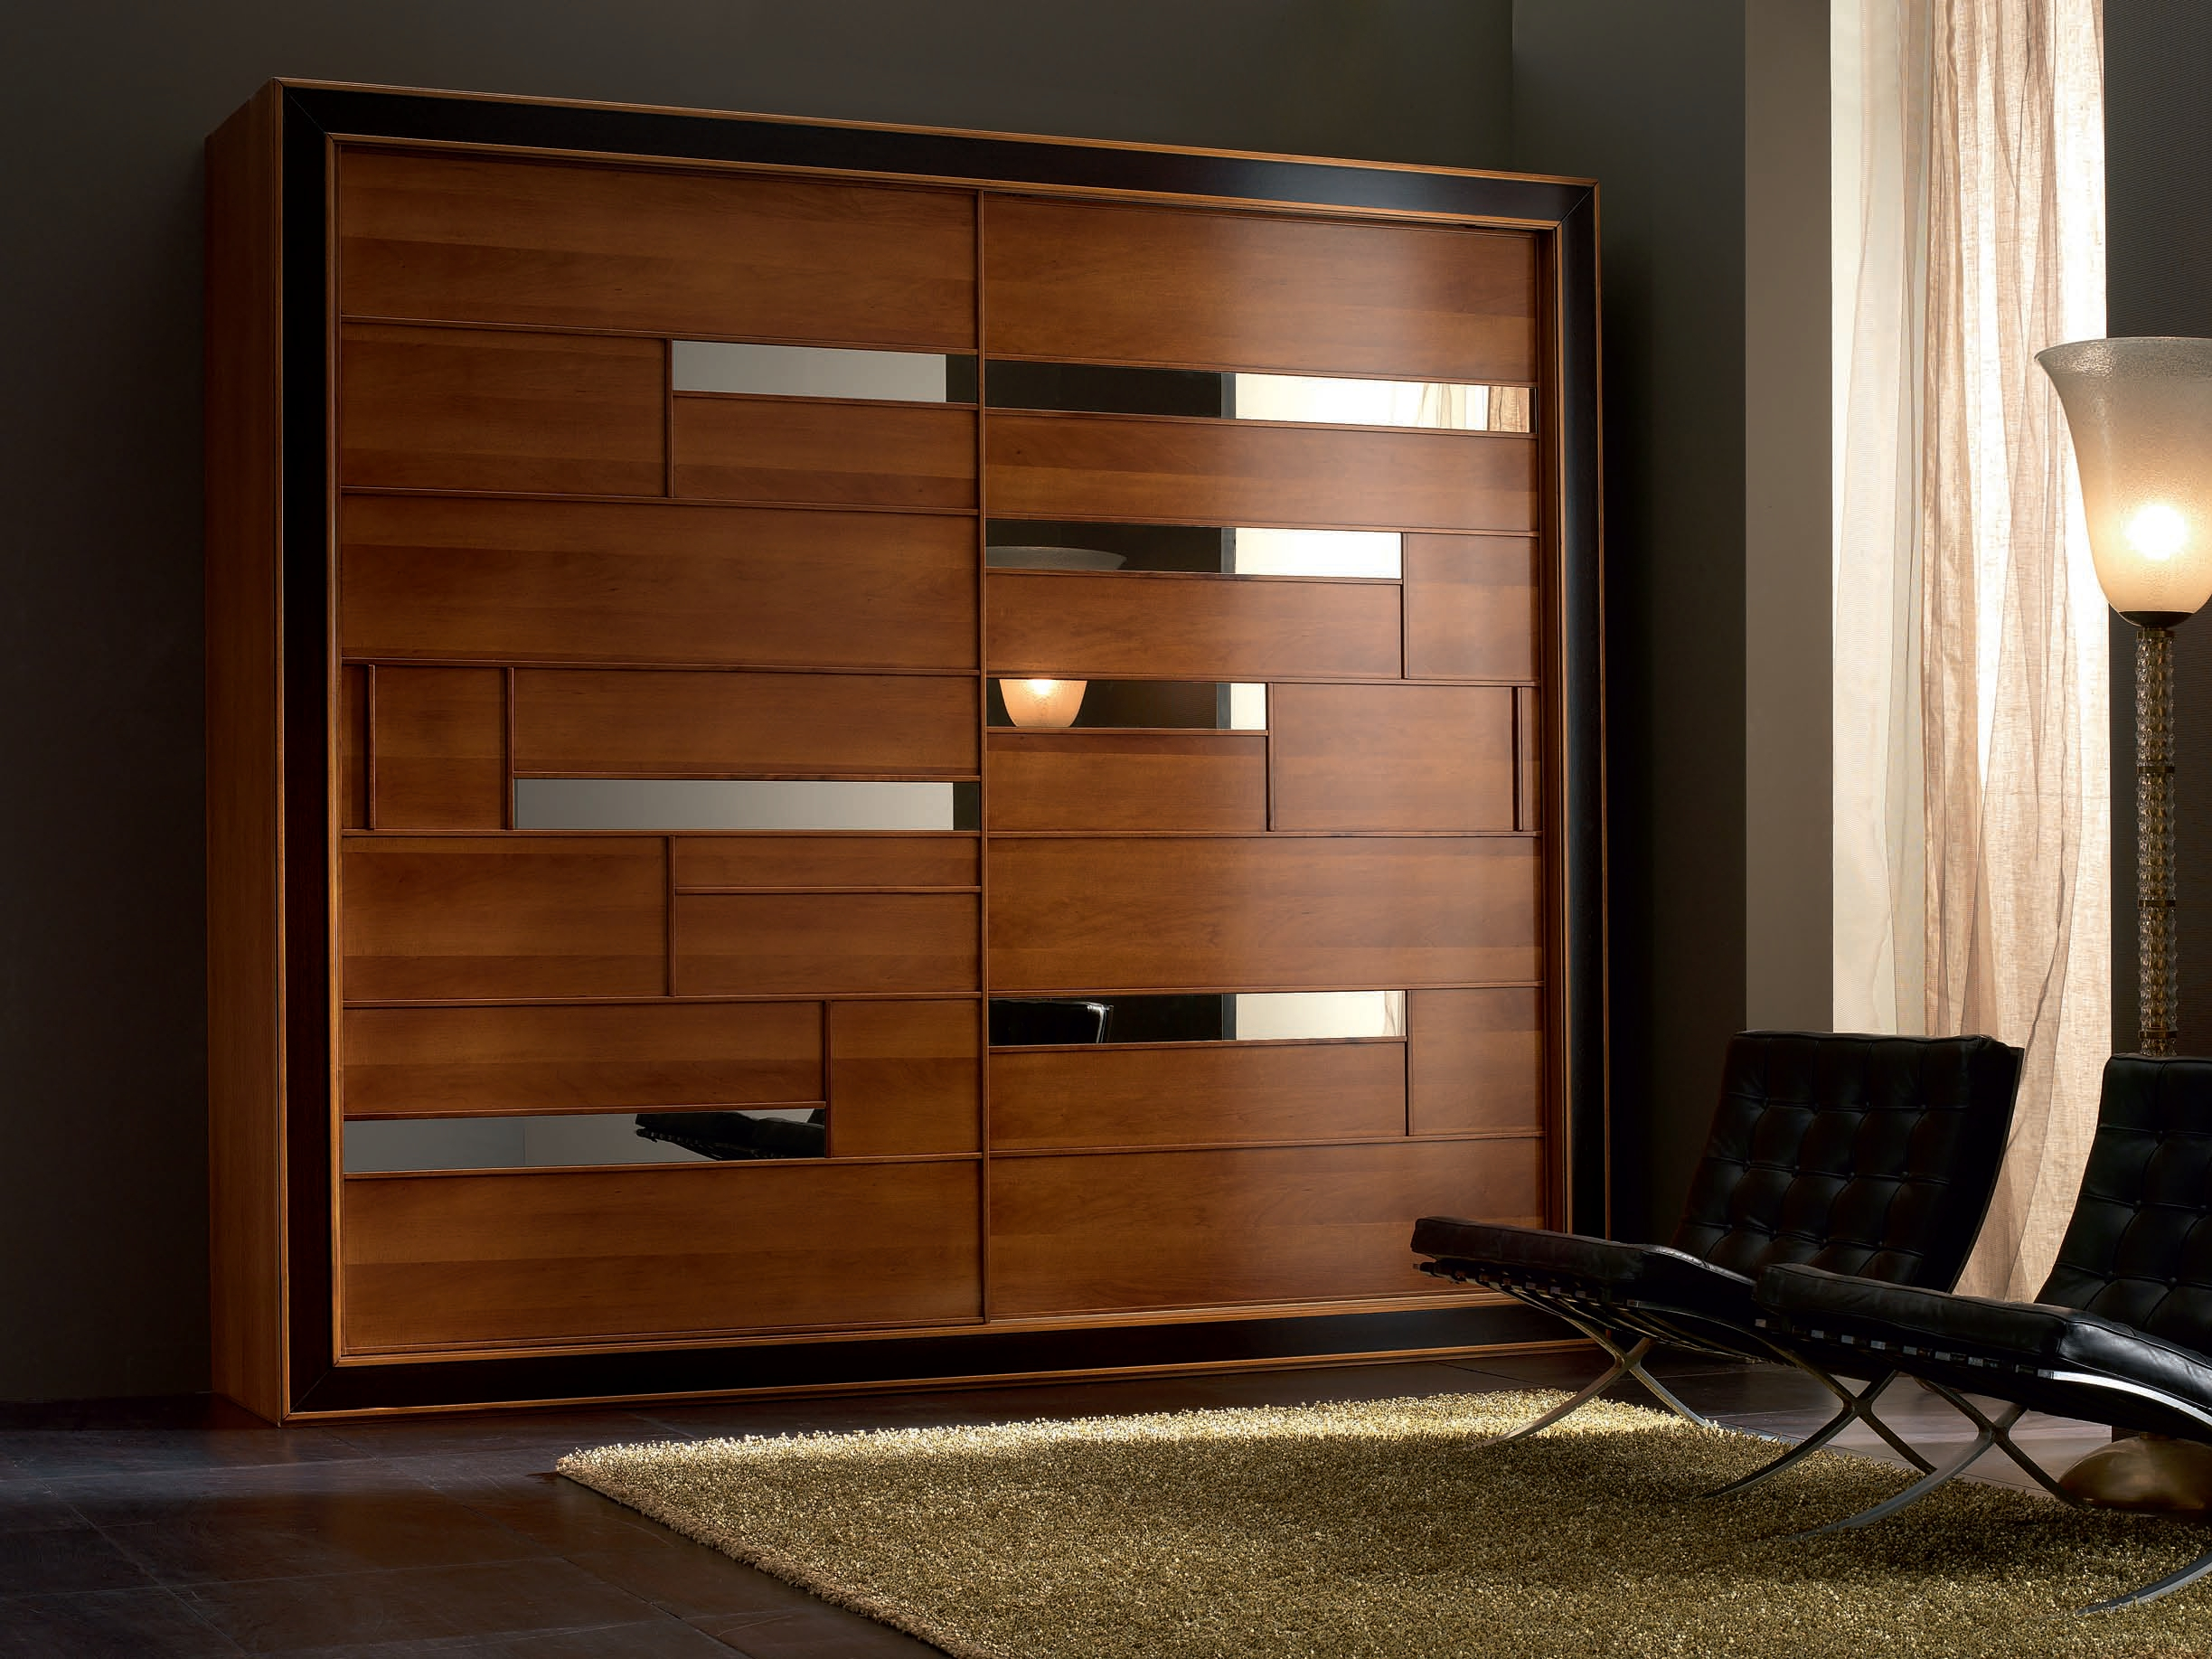 Шкаф из массива дерева в стиле модерн